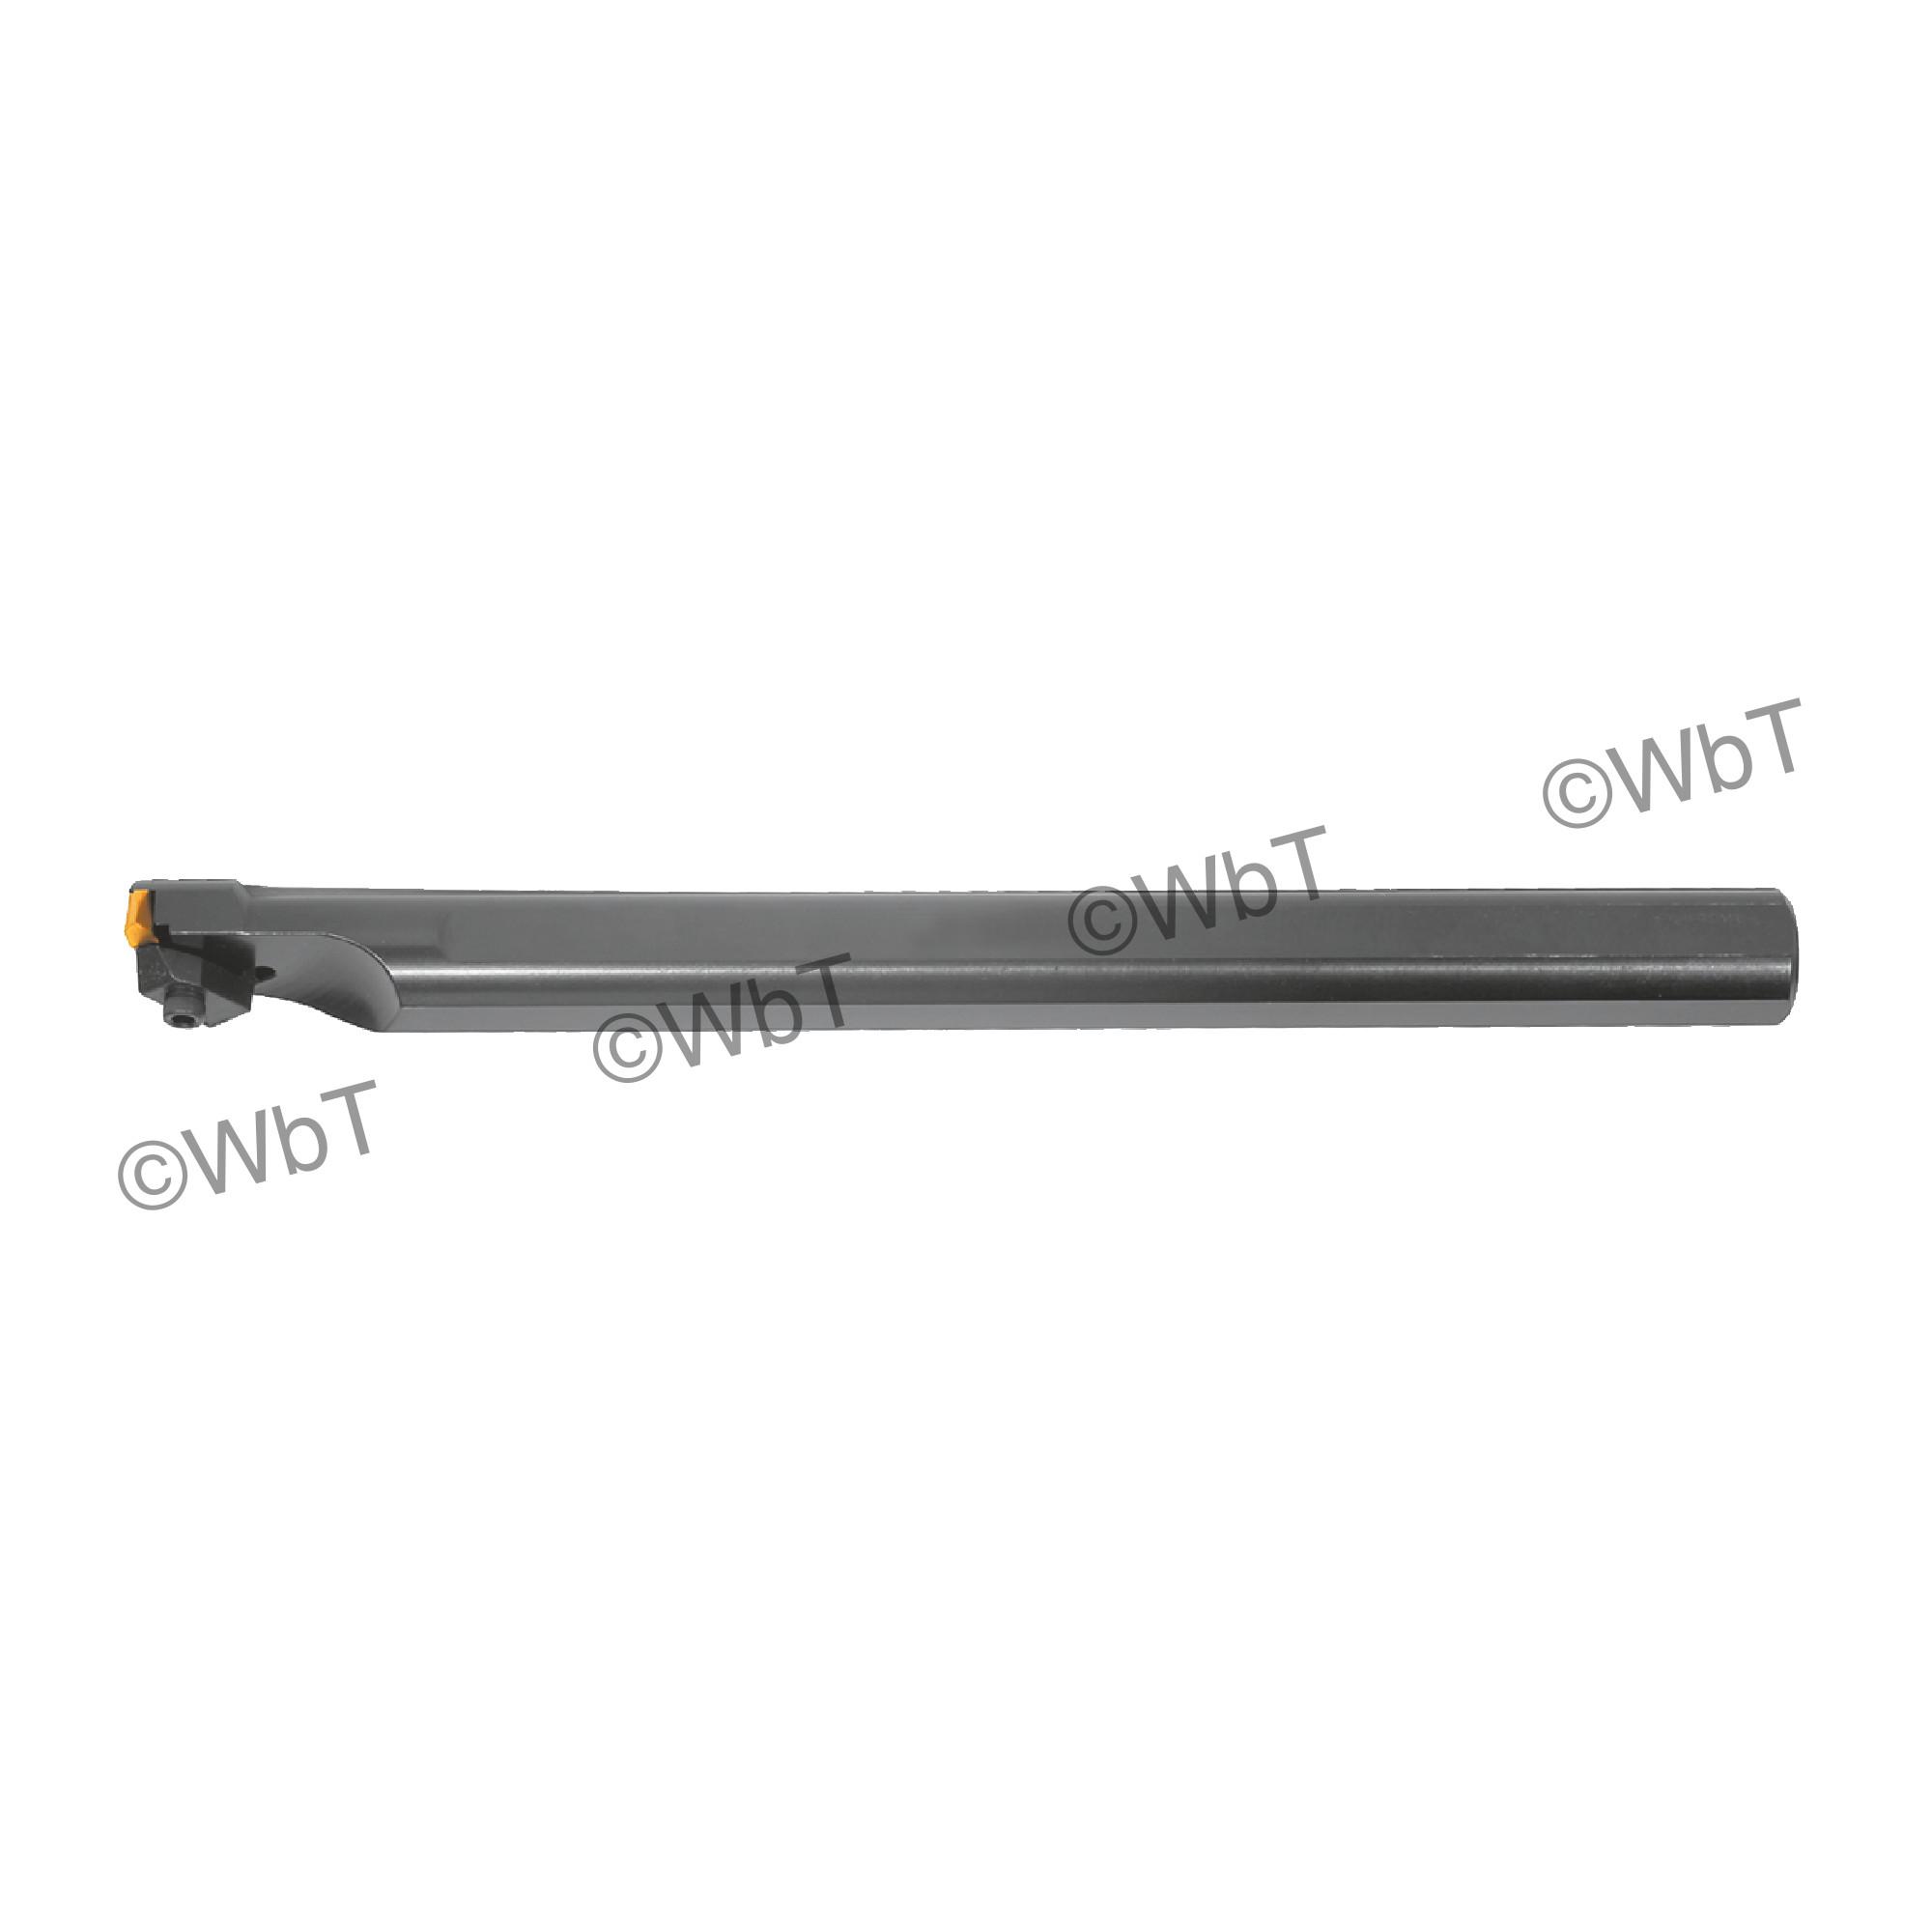 "TTC PRODUCTION - S10S-TNEL-2 / 0.625"" Shank Diameter Boring Bar for Size 2 Inserts / Left Hand"